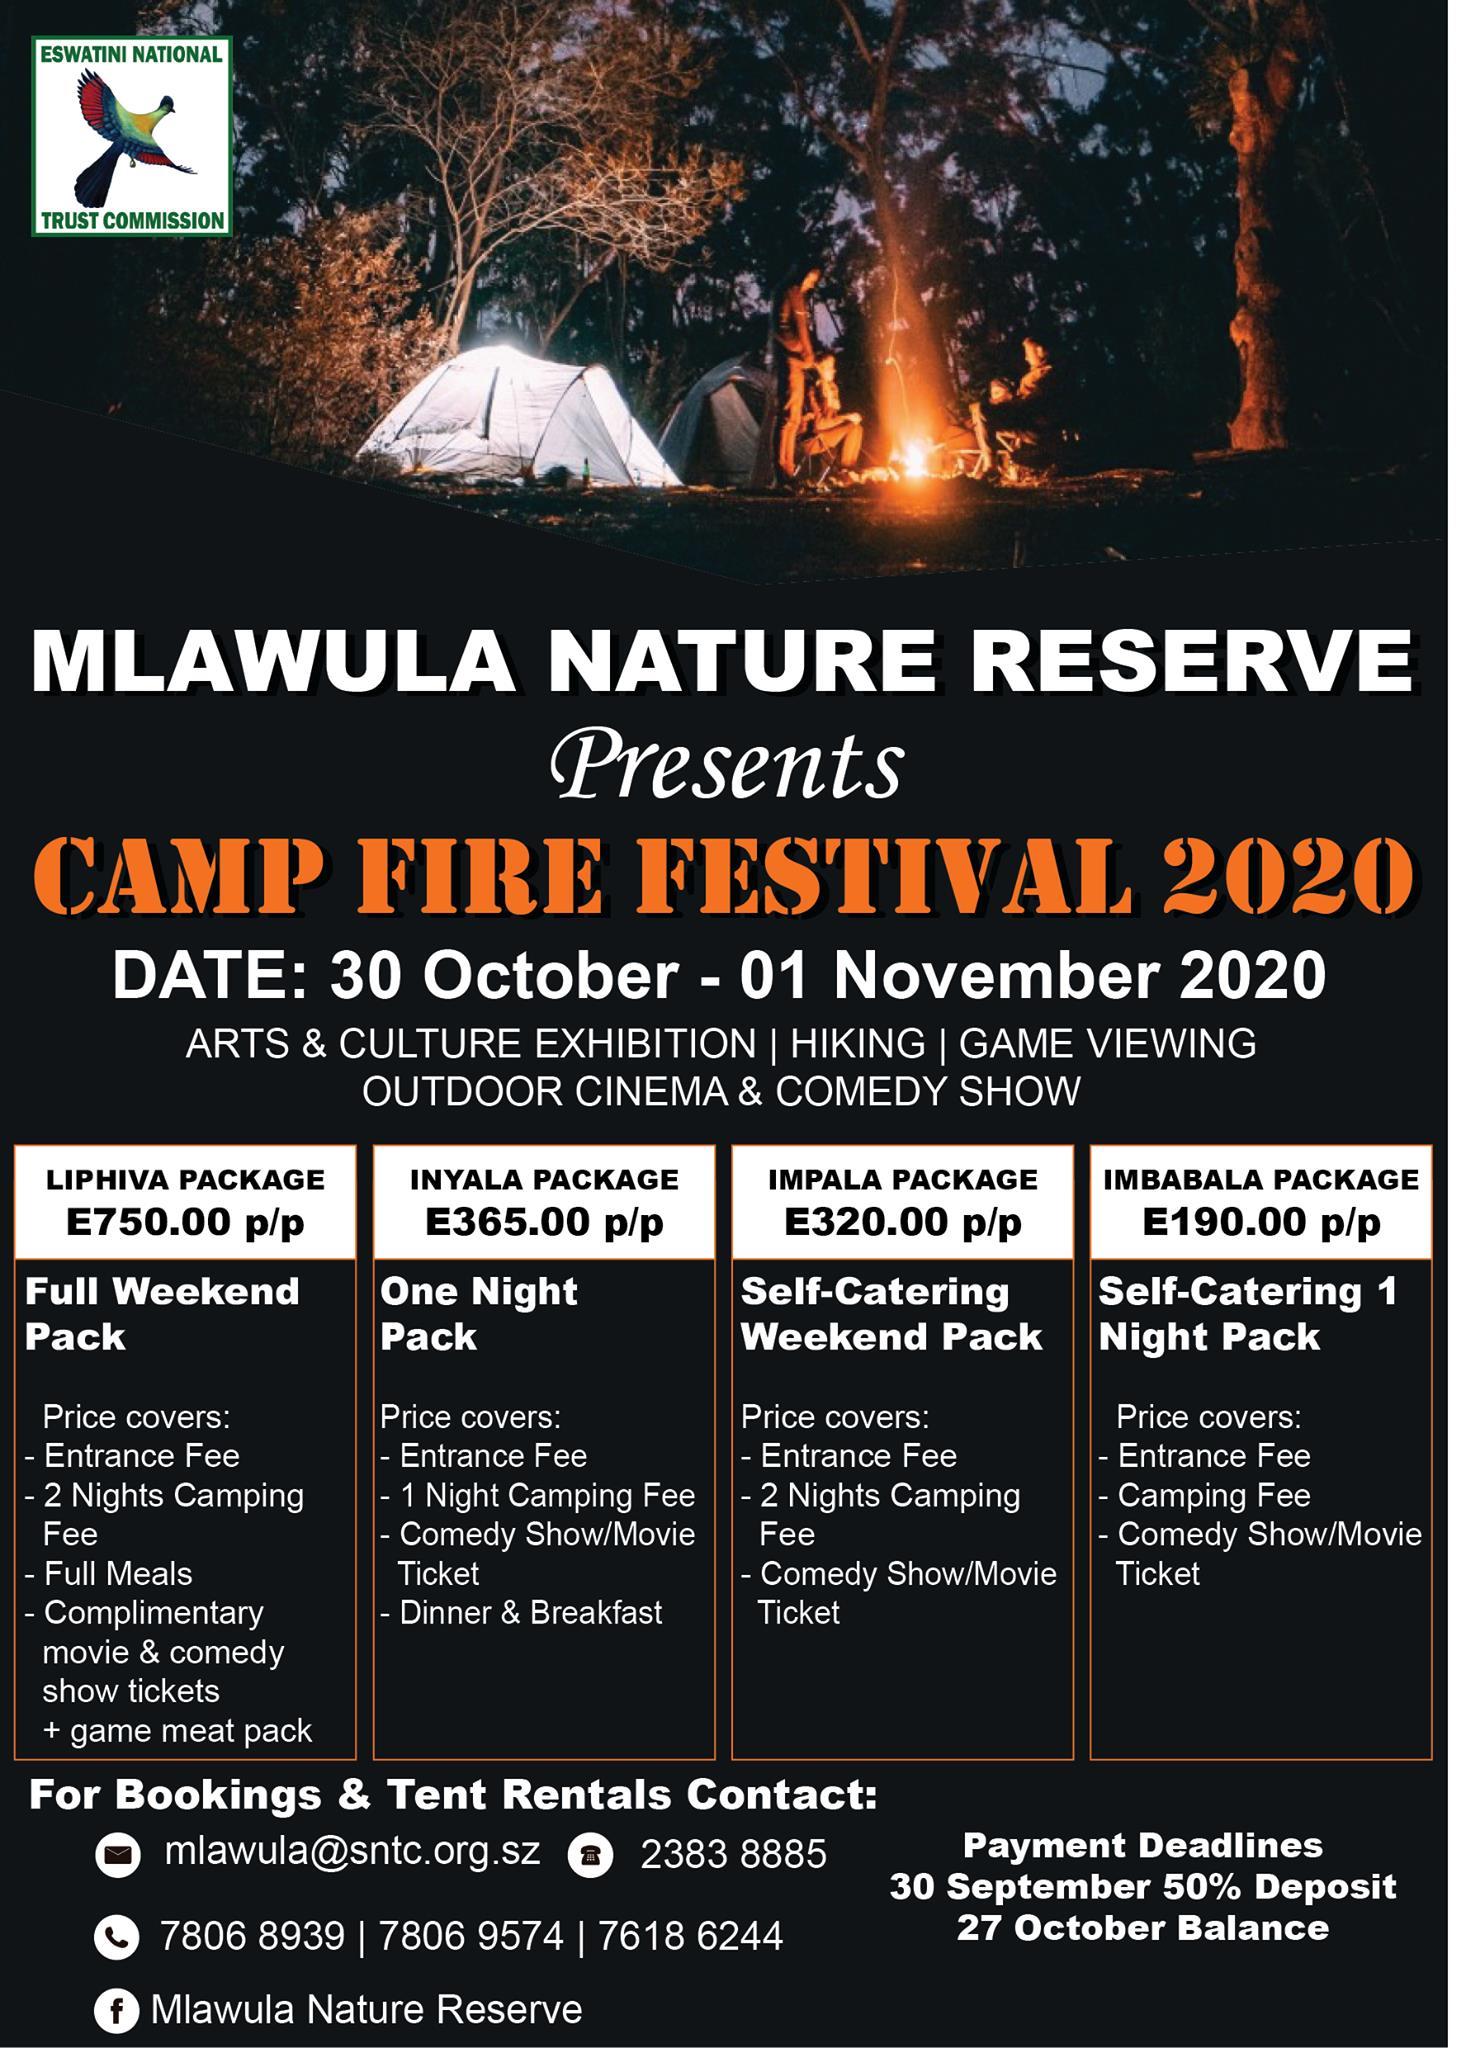 Camp Fire Festival 2020